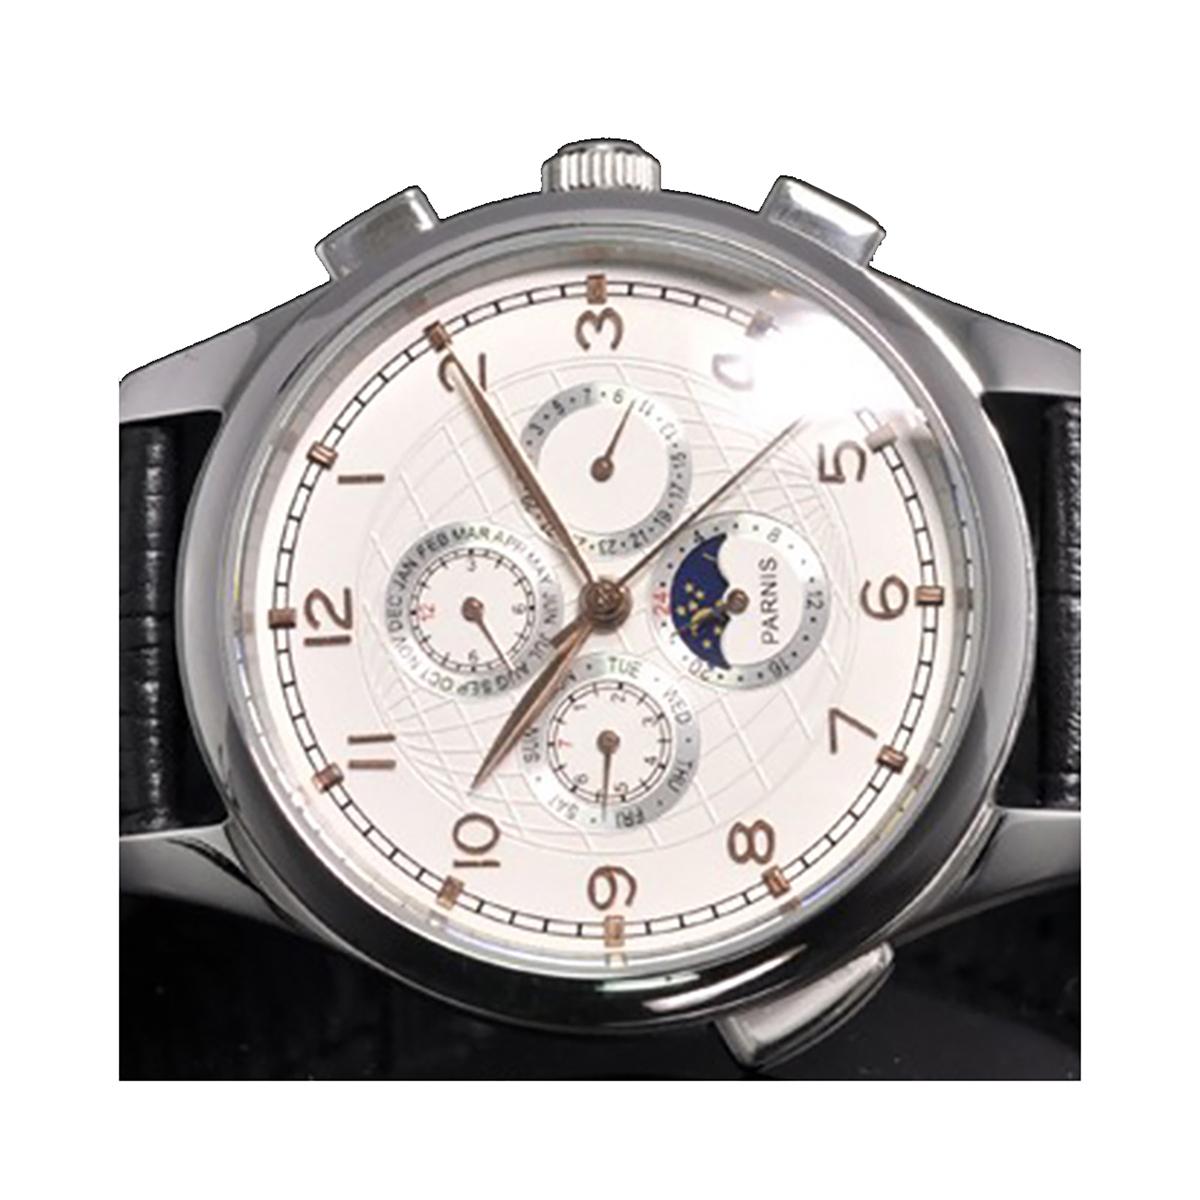 PARNIS パーニス 自動巻き 腕時計 メンズ [PN-248S7AL] 並行輸入品 当店保証24ヵ月